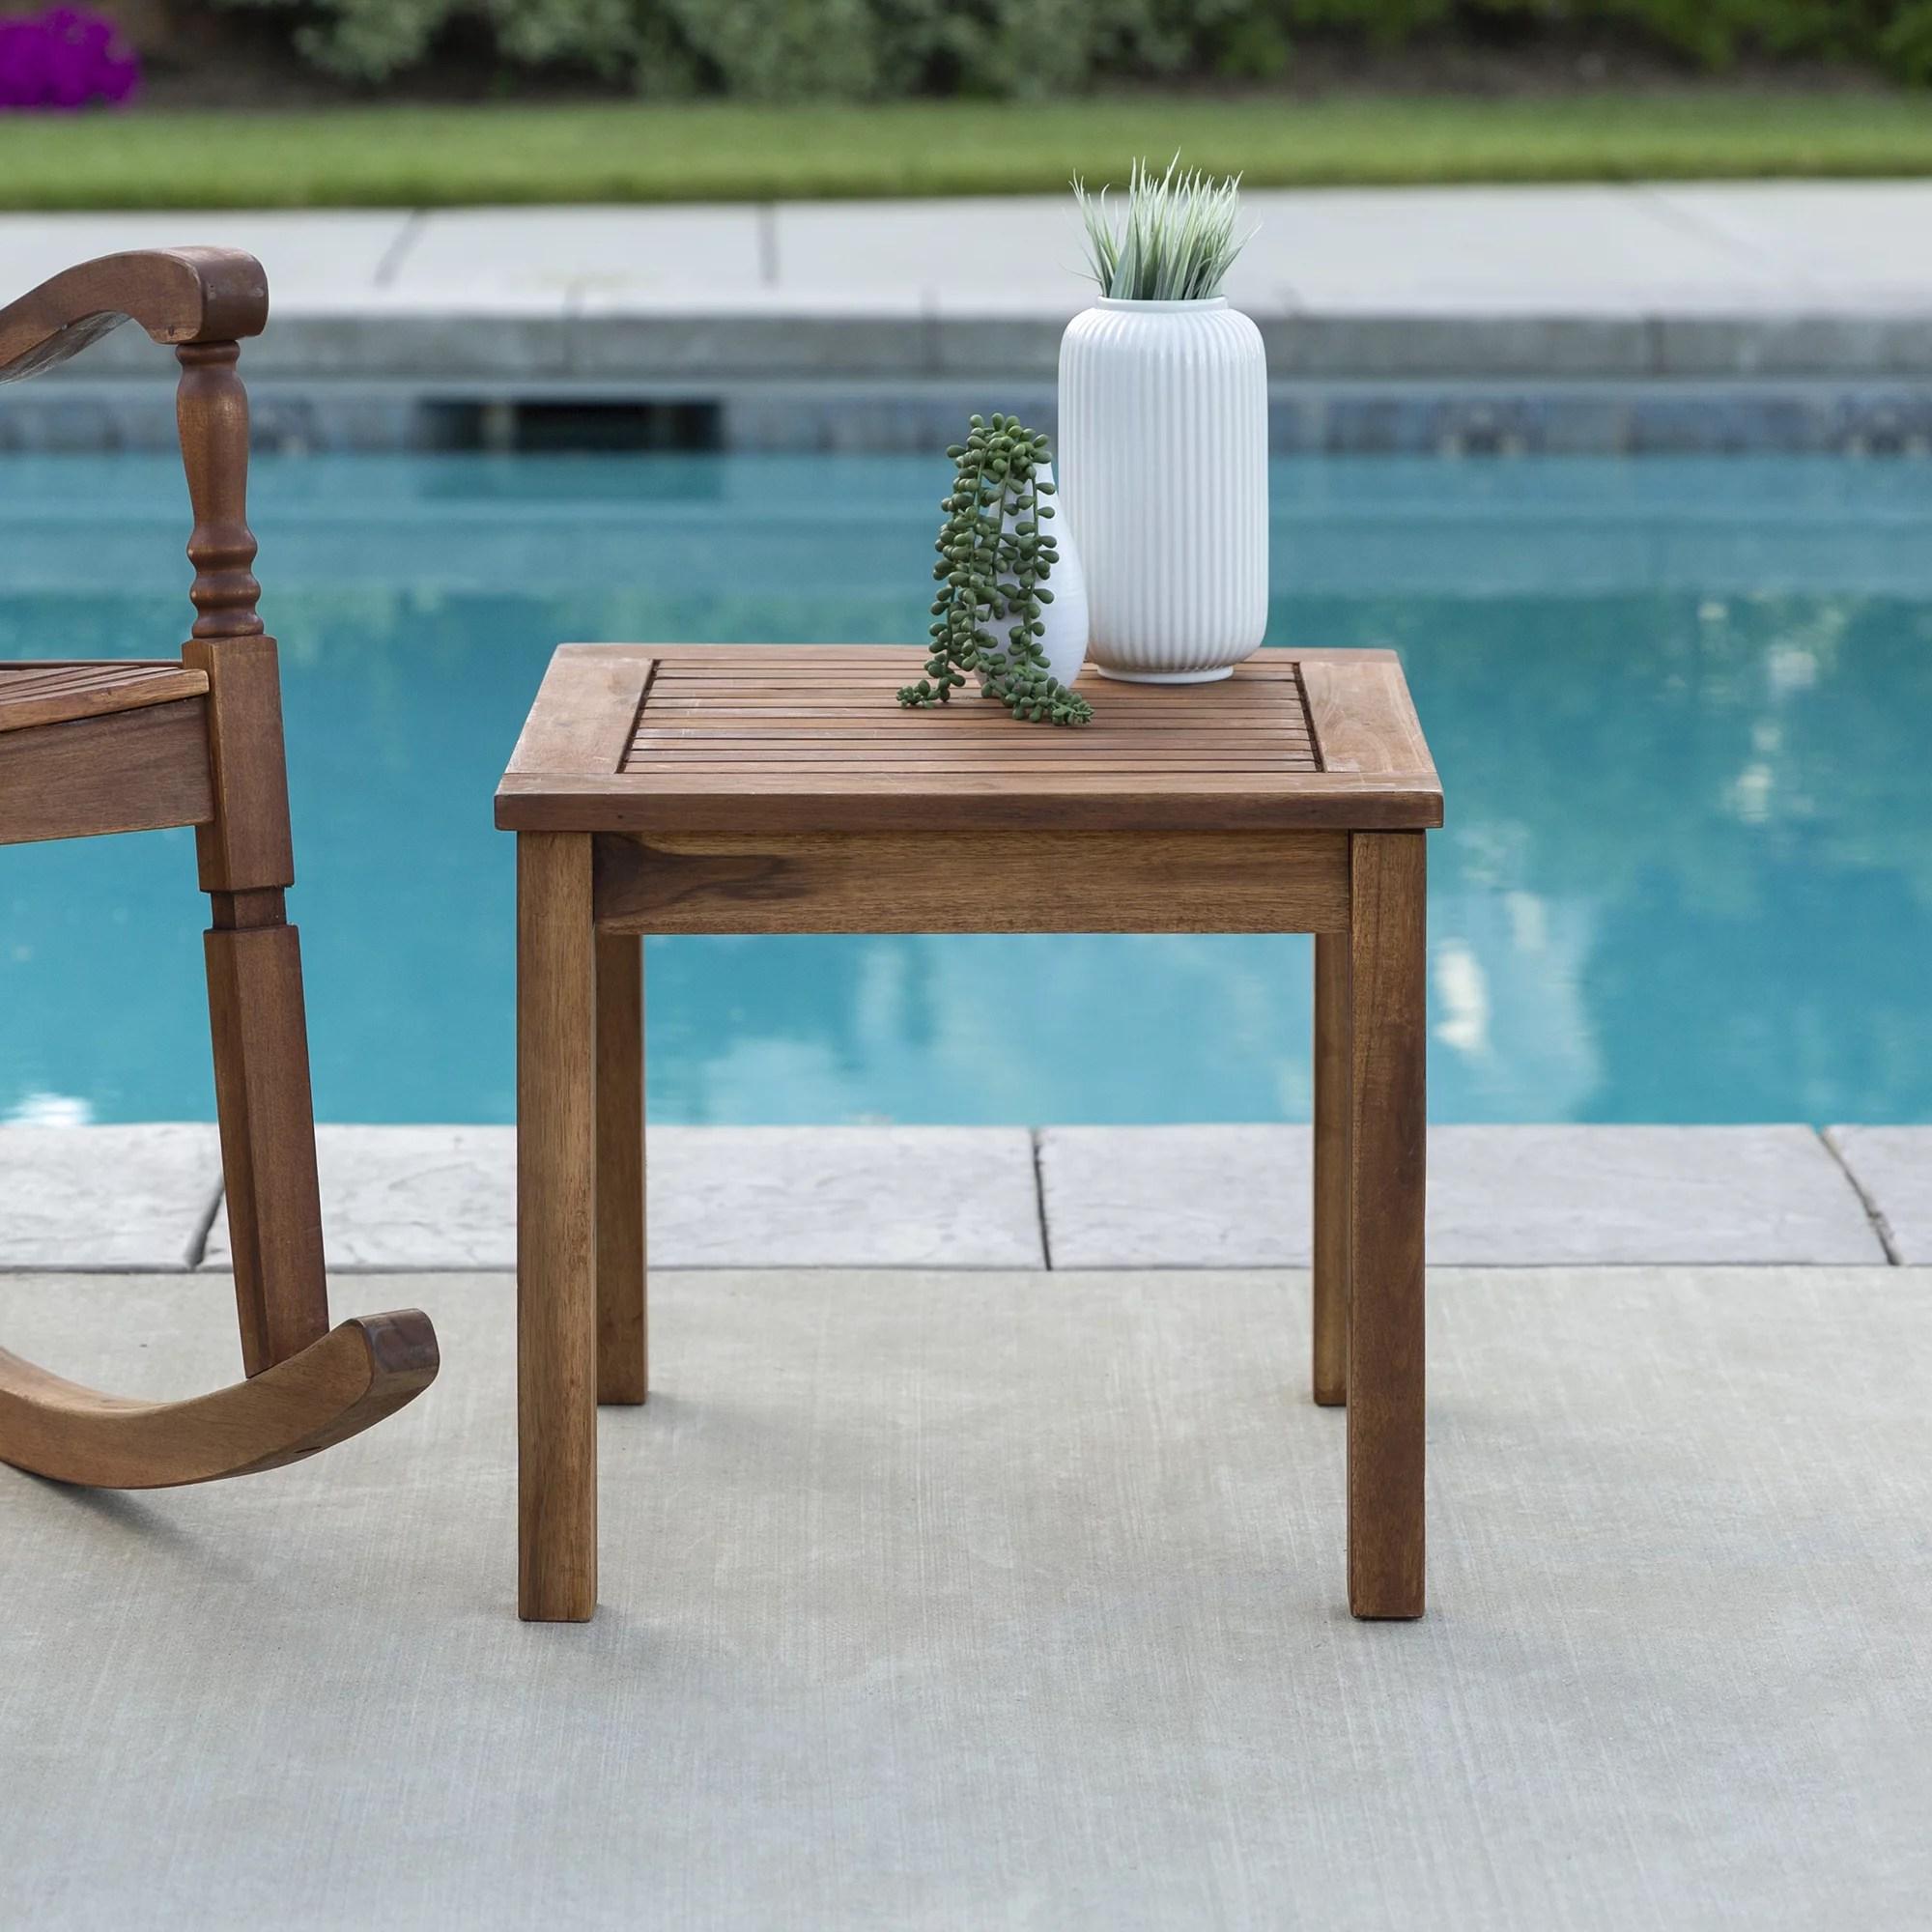 manor park acacia wood outdoor patio end table brown